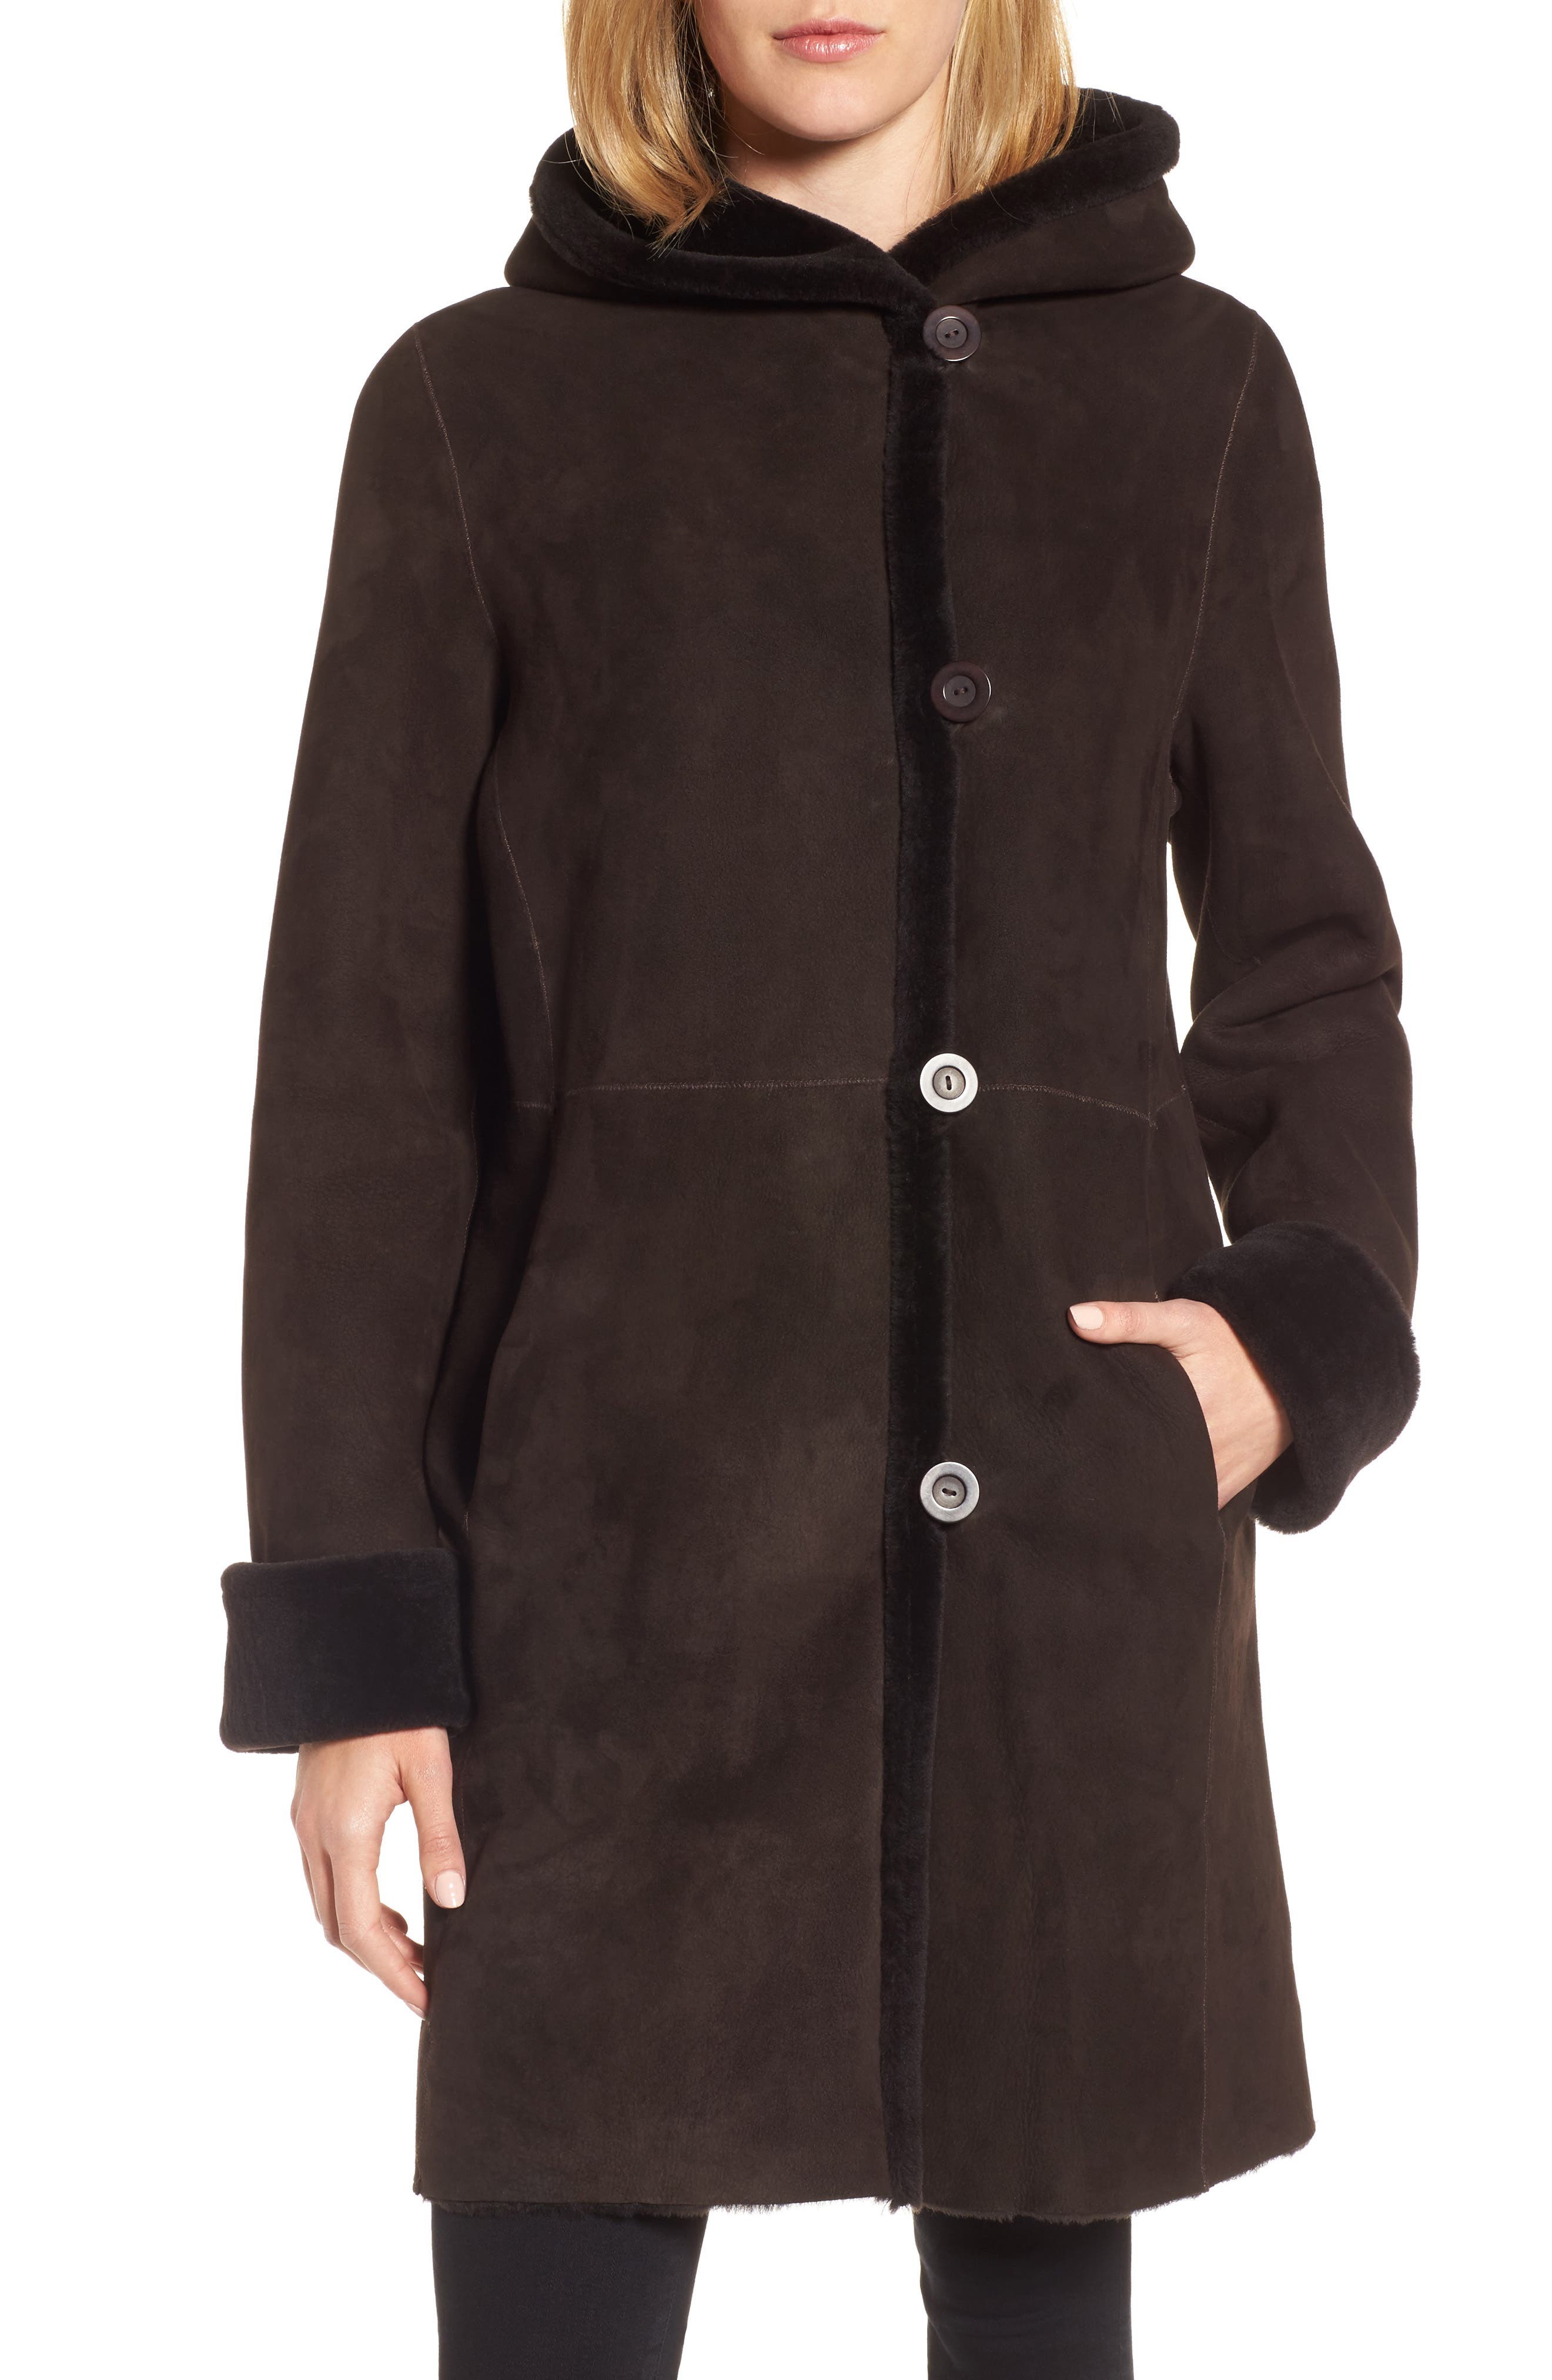 Hooded Genuine Shearling Coat,                             Main thumbnail 1, color,                             206